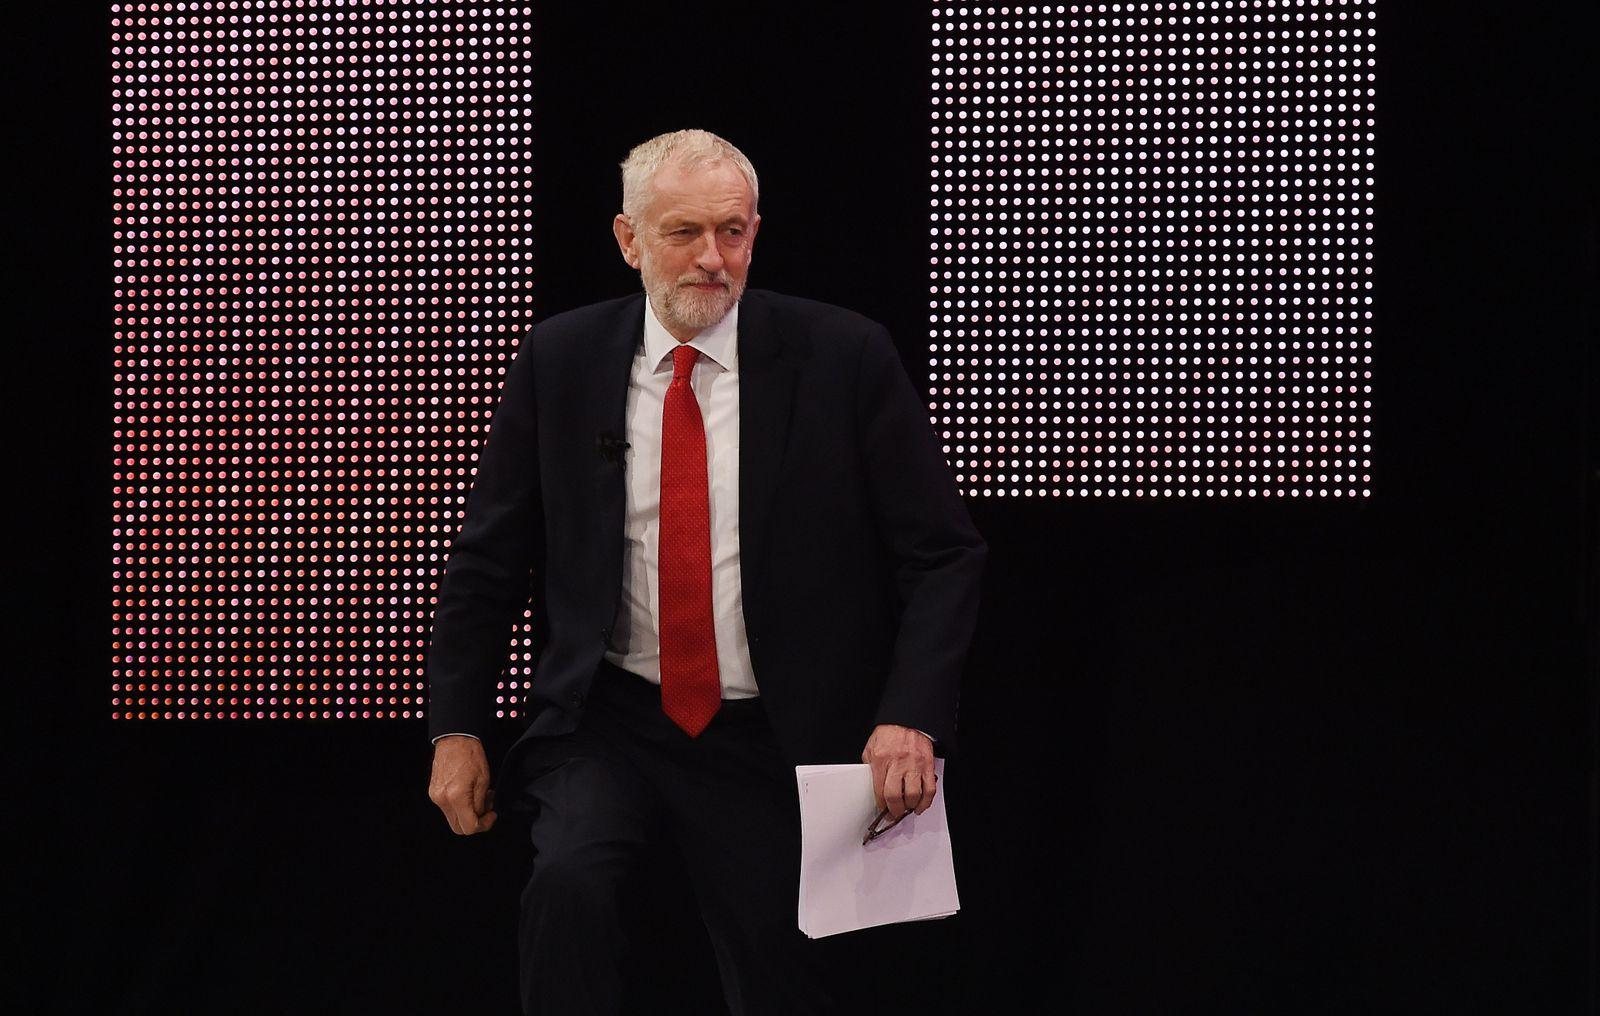 Confederation of British Industry (CBI) Conference in London, United Kingdom - 19 Nov 2018